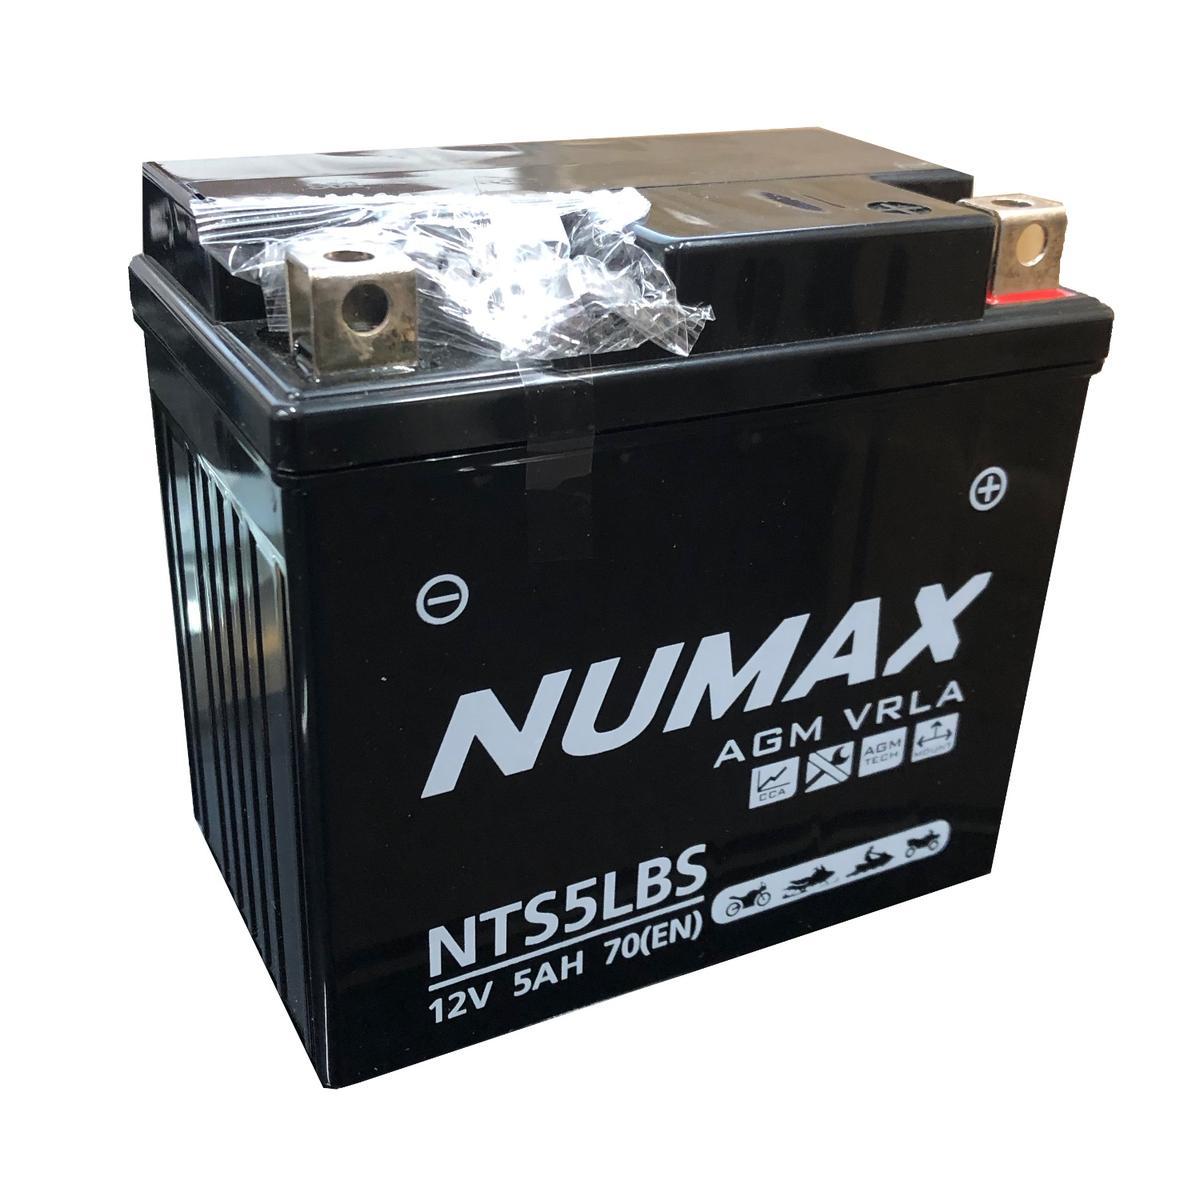 Numax 12v NTS5LBS Motorbike Bike Battery YAMAHA 125cc TDR125 YTX5L-4